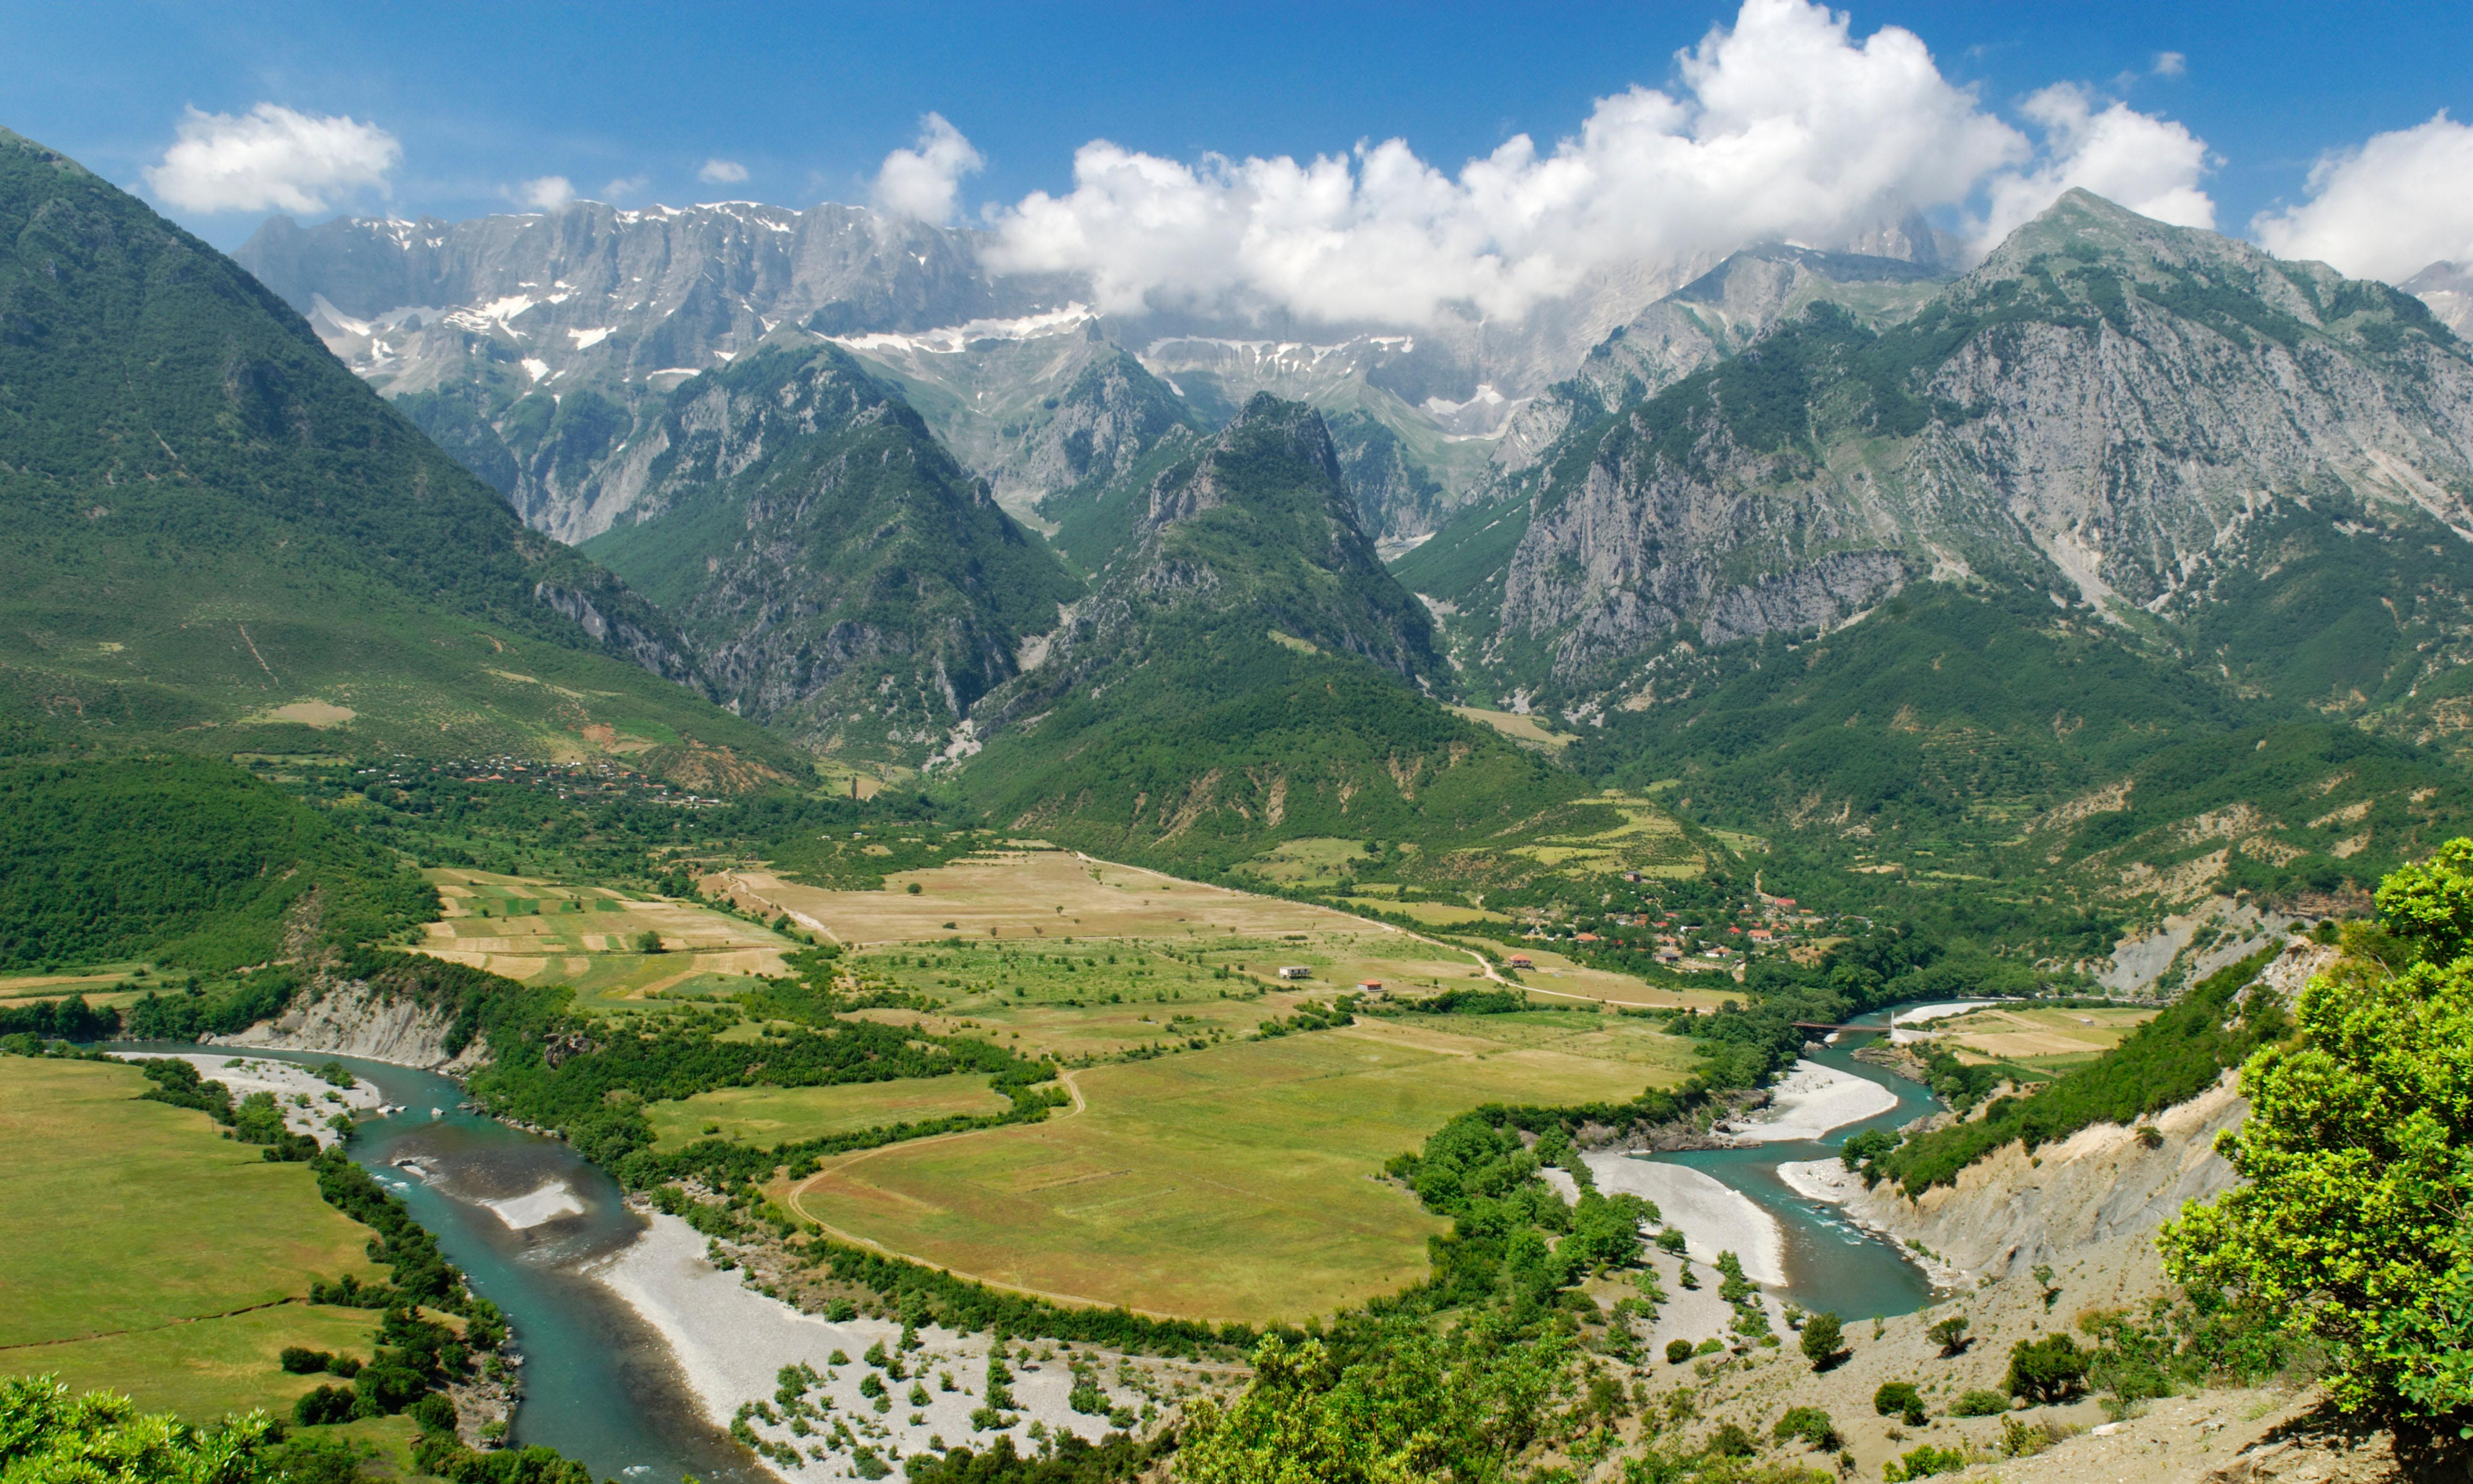 Adventure in Albania: kayaking in one of Europe's final frontiers